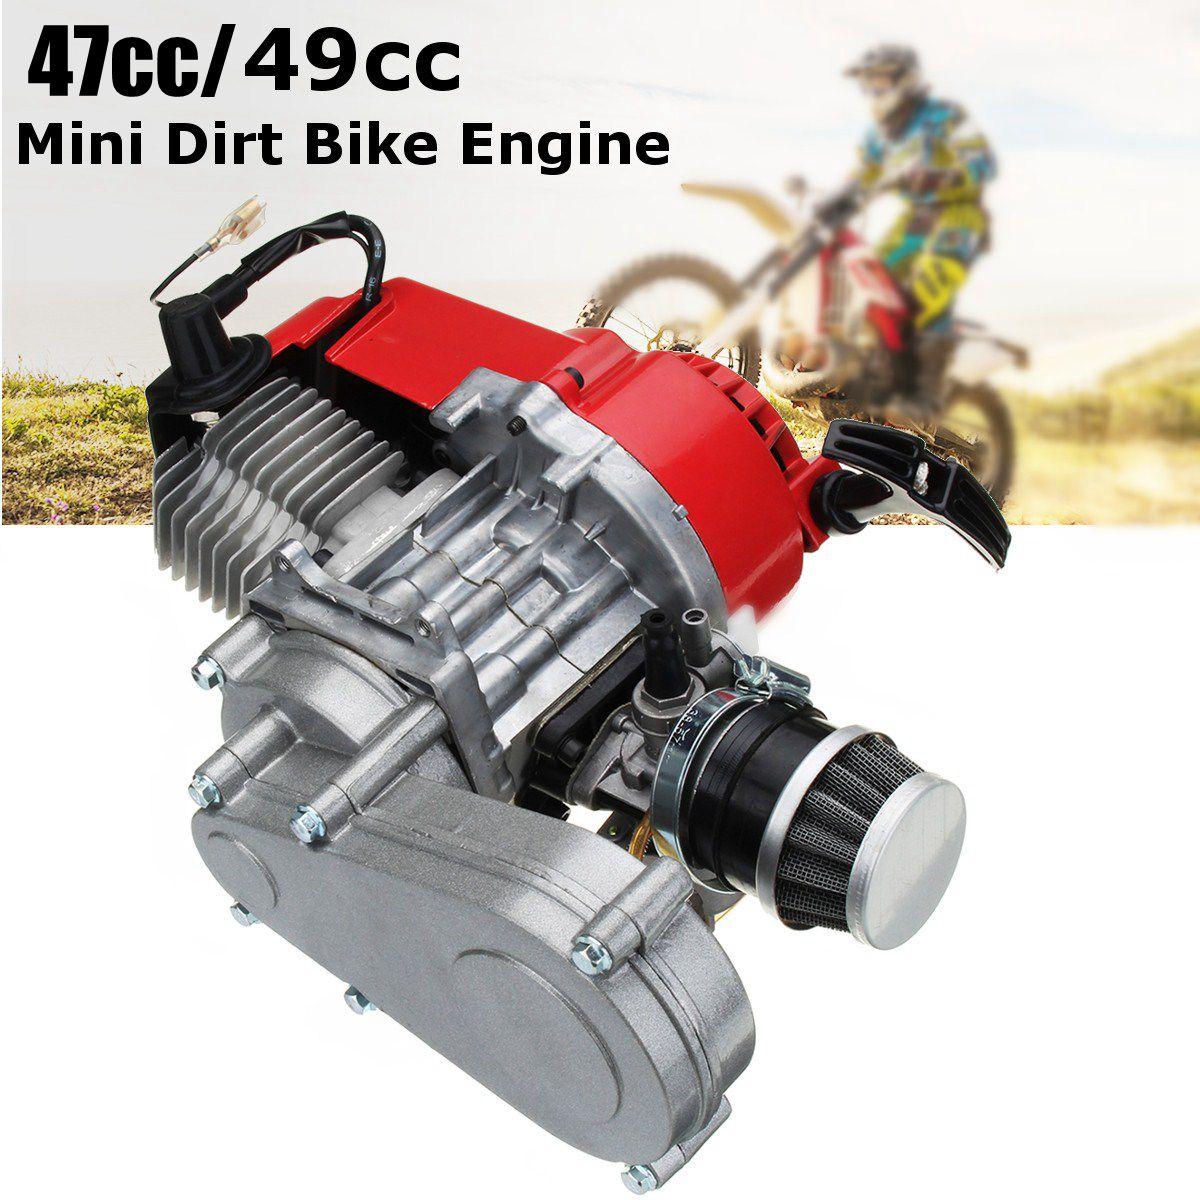 49cc Engine 2-Stroke Pull Start with Transmission For Mini Moto Dirt Bike Red Motorcycle Starter